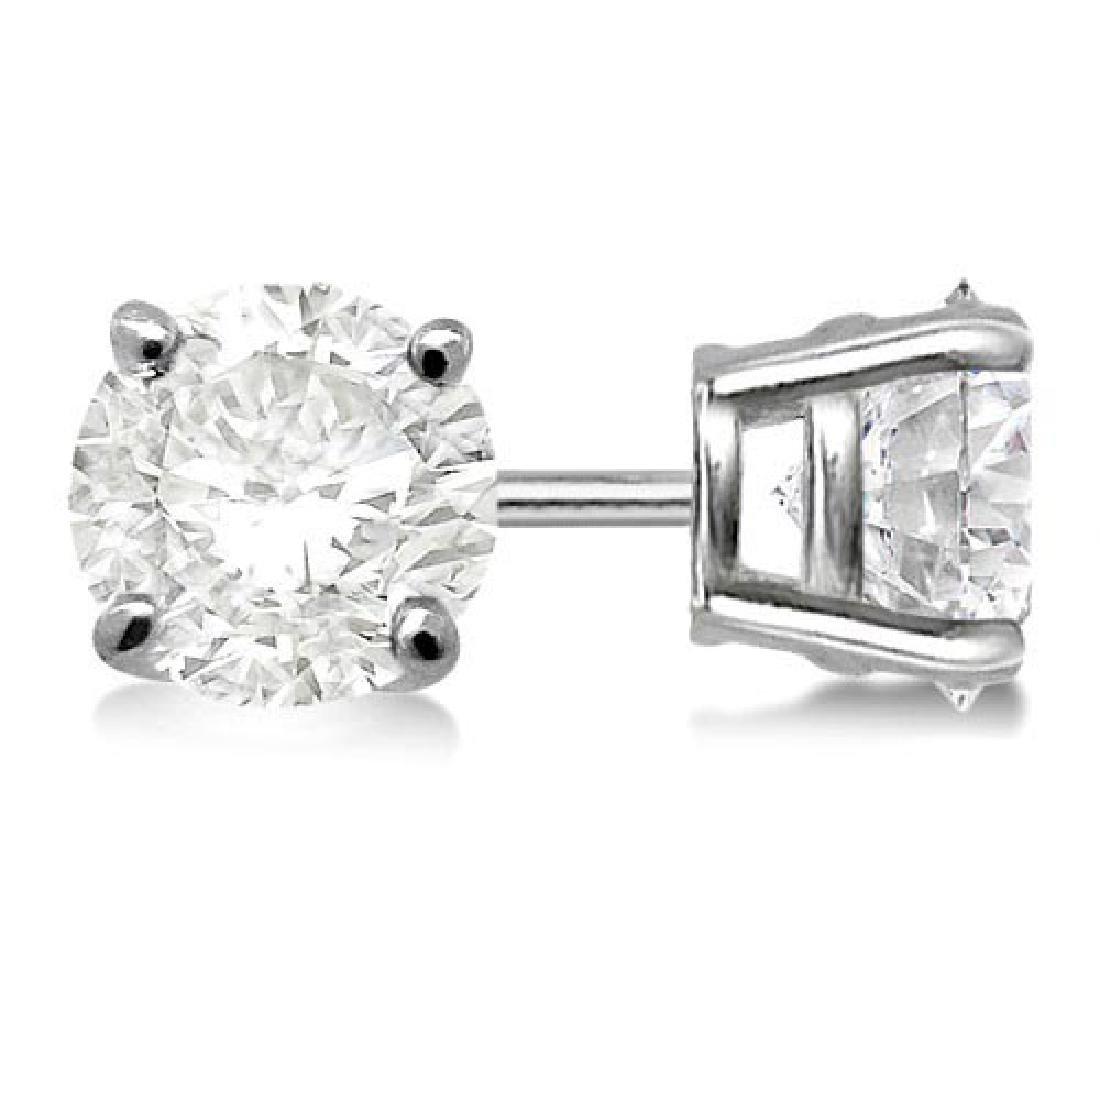 Certified 1.24 CTW Round Diamond Stud Earrings G/SI3